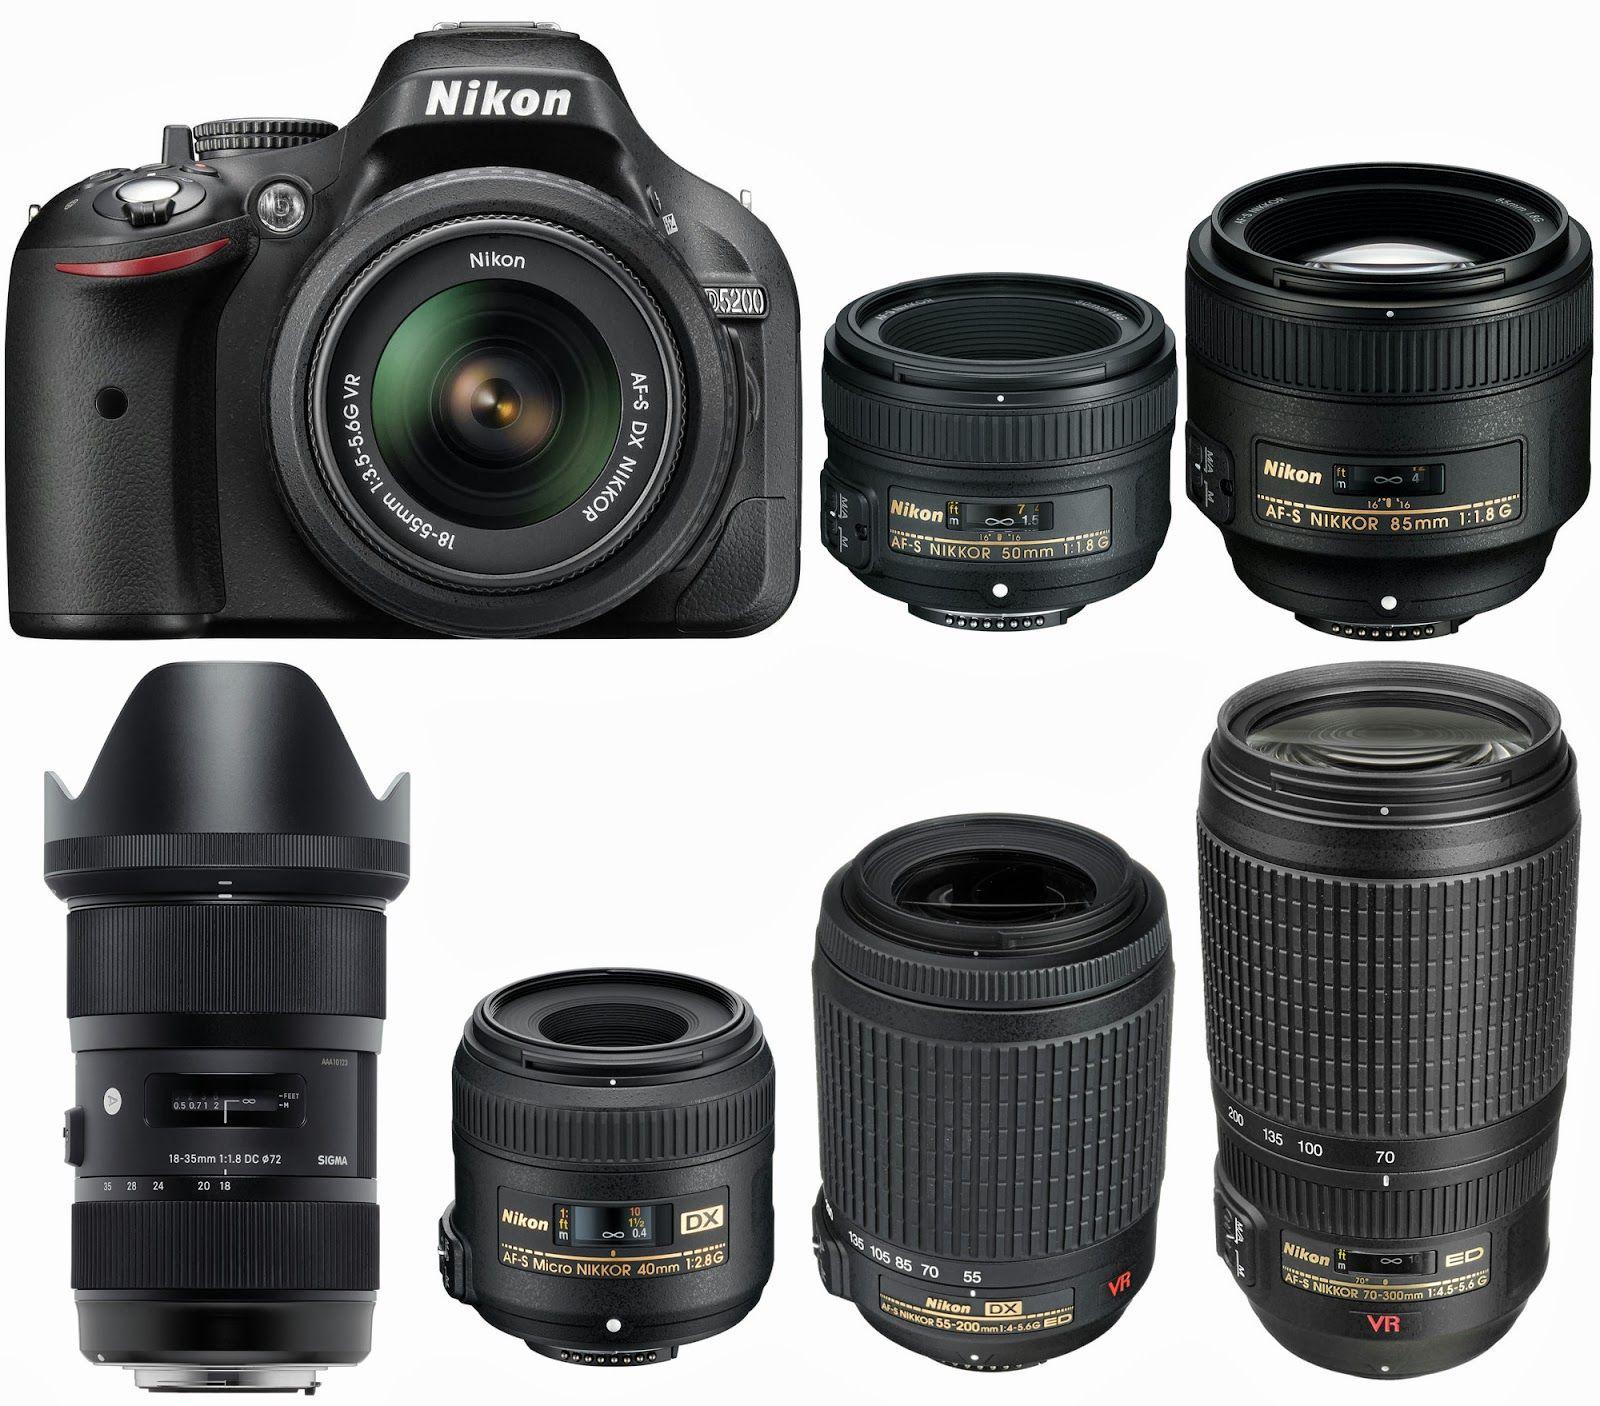 Nikon D5300 And Nikon D610 Ready Shocking Photographer Camera Photography Photography Camera Dslr Photography Tips